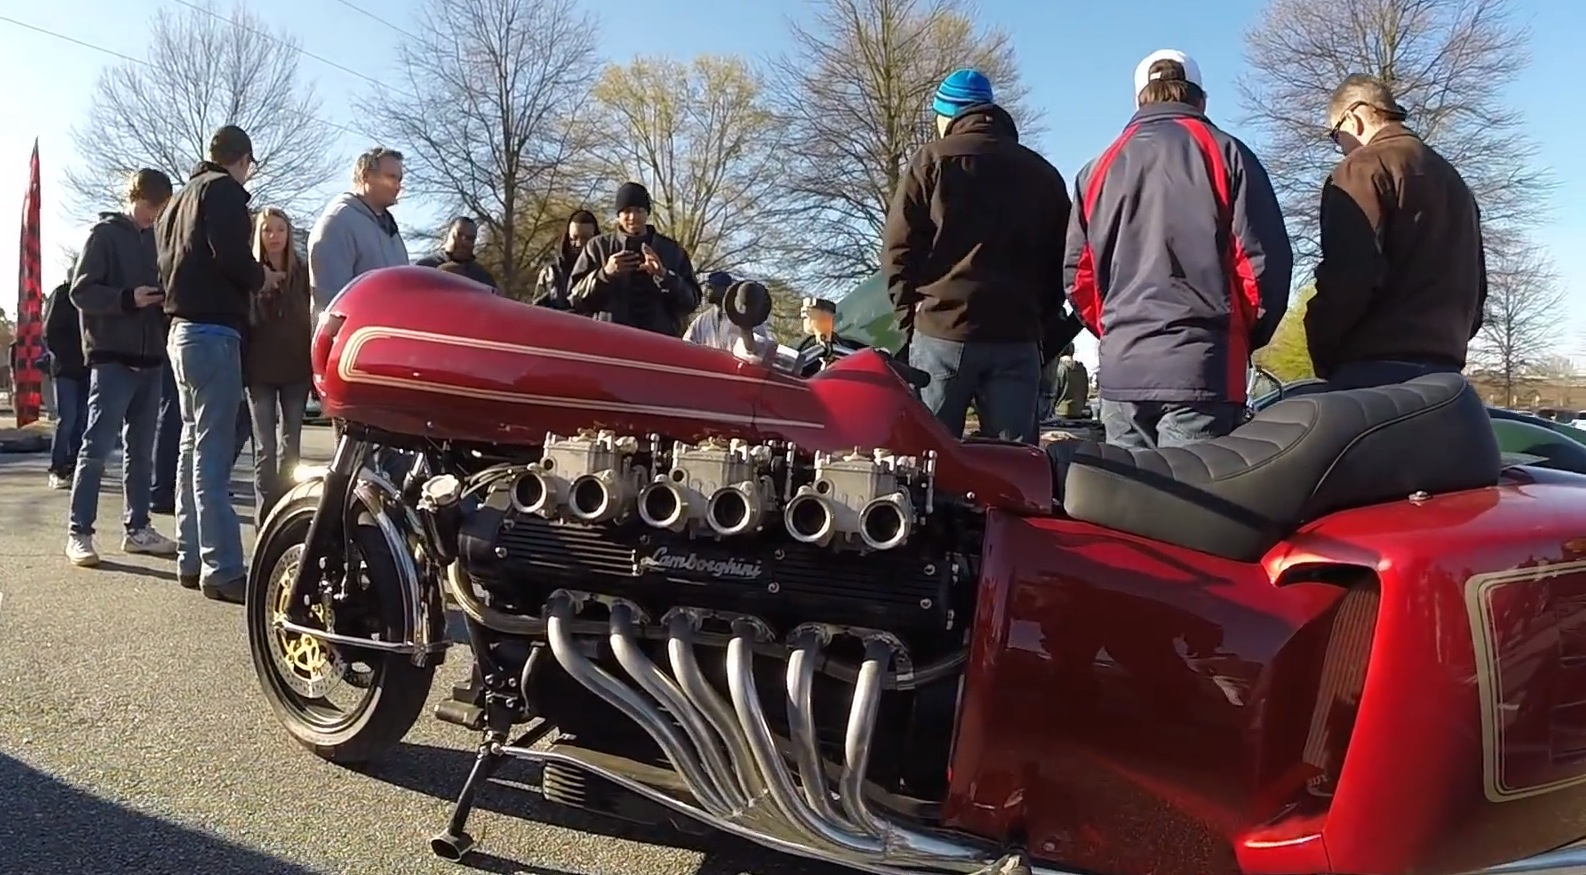 Lamborghini V12 Powered Motorcycle Gets Cool Neo Retro Fairings